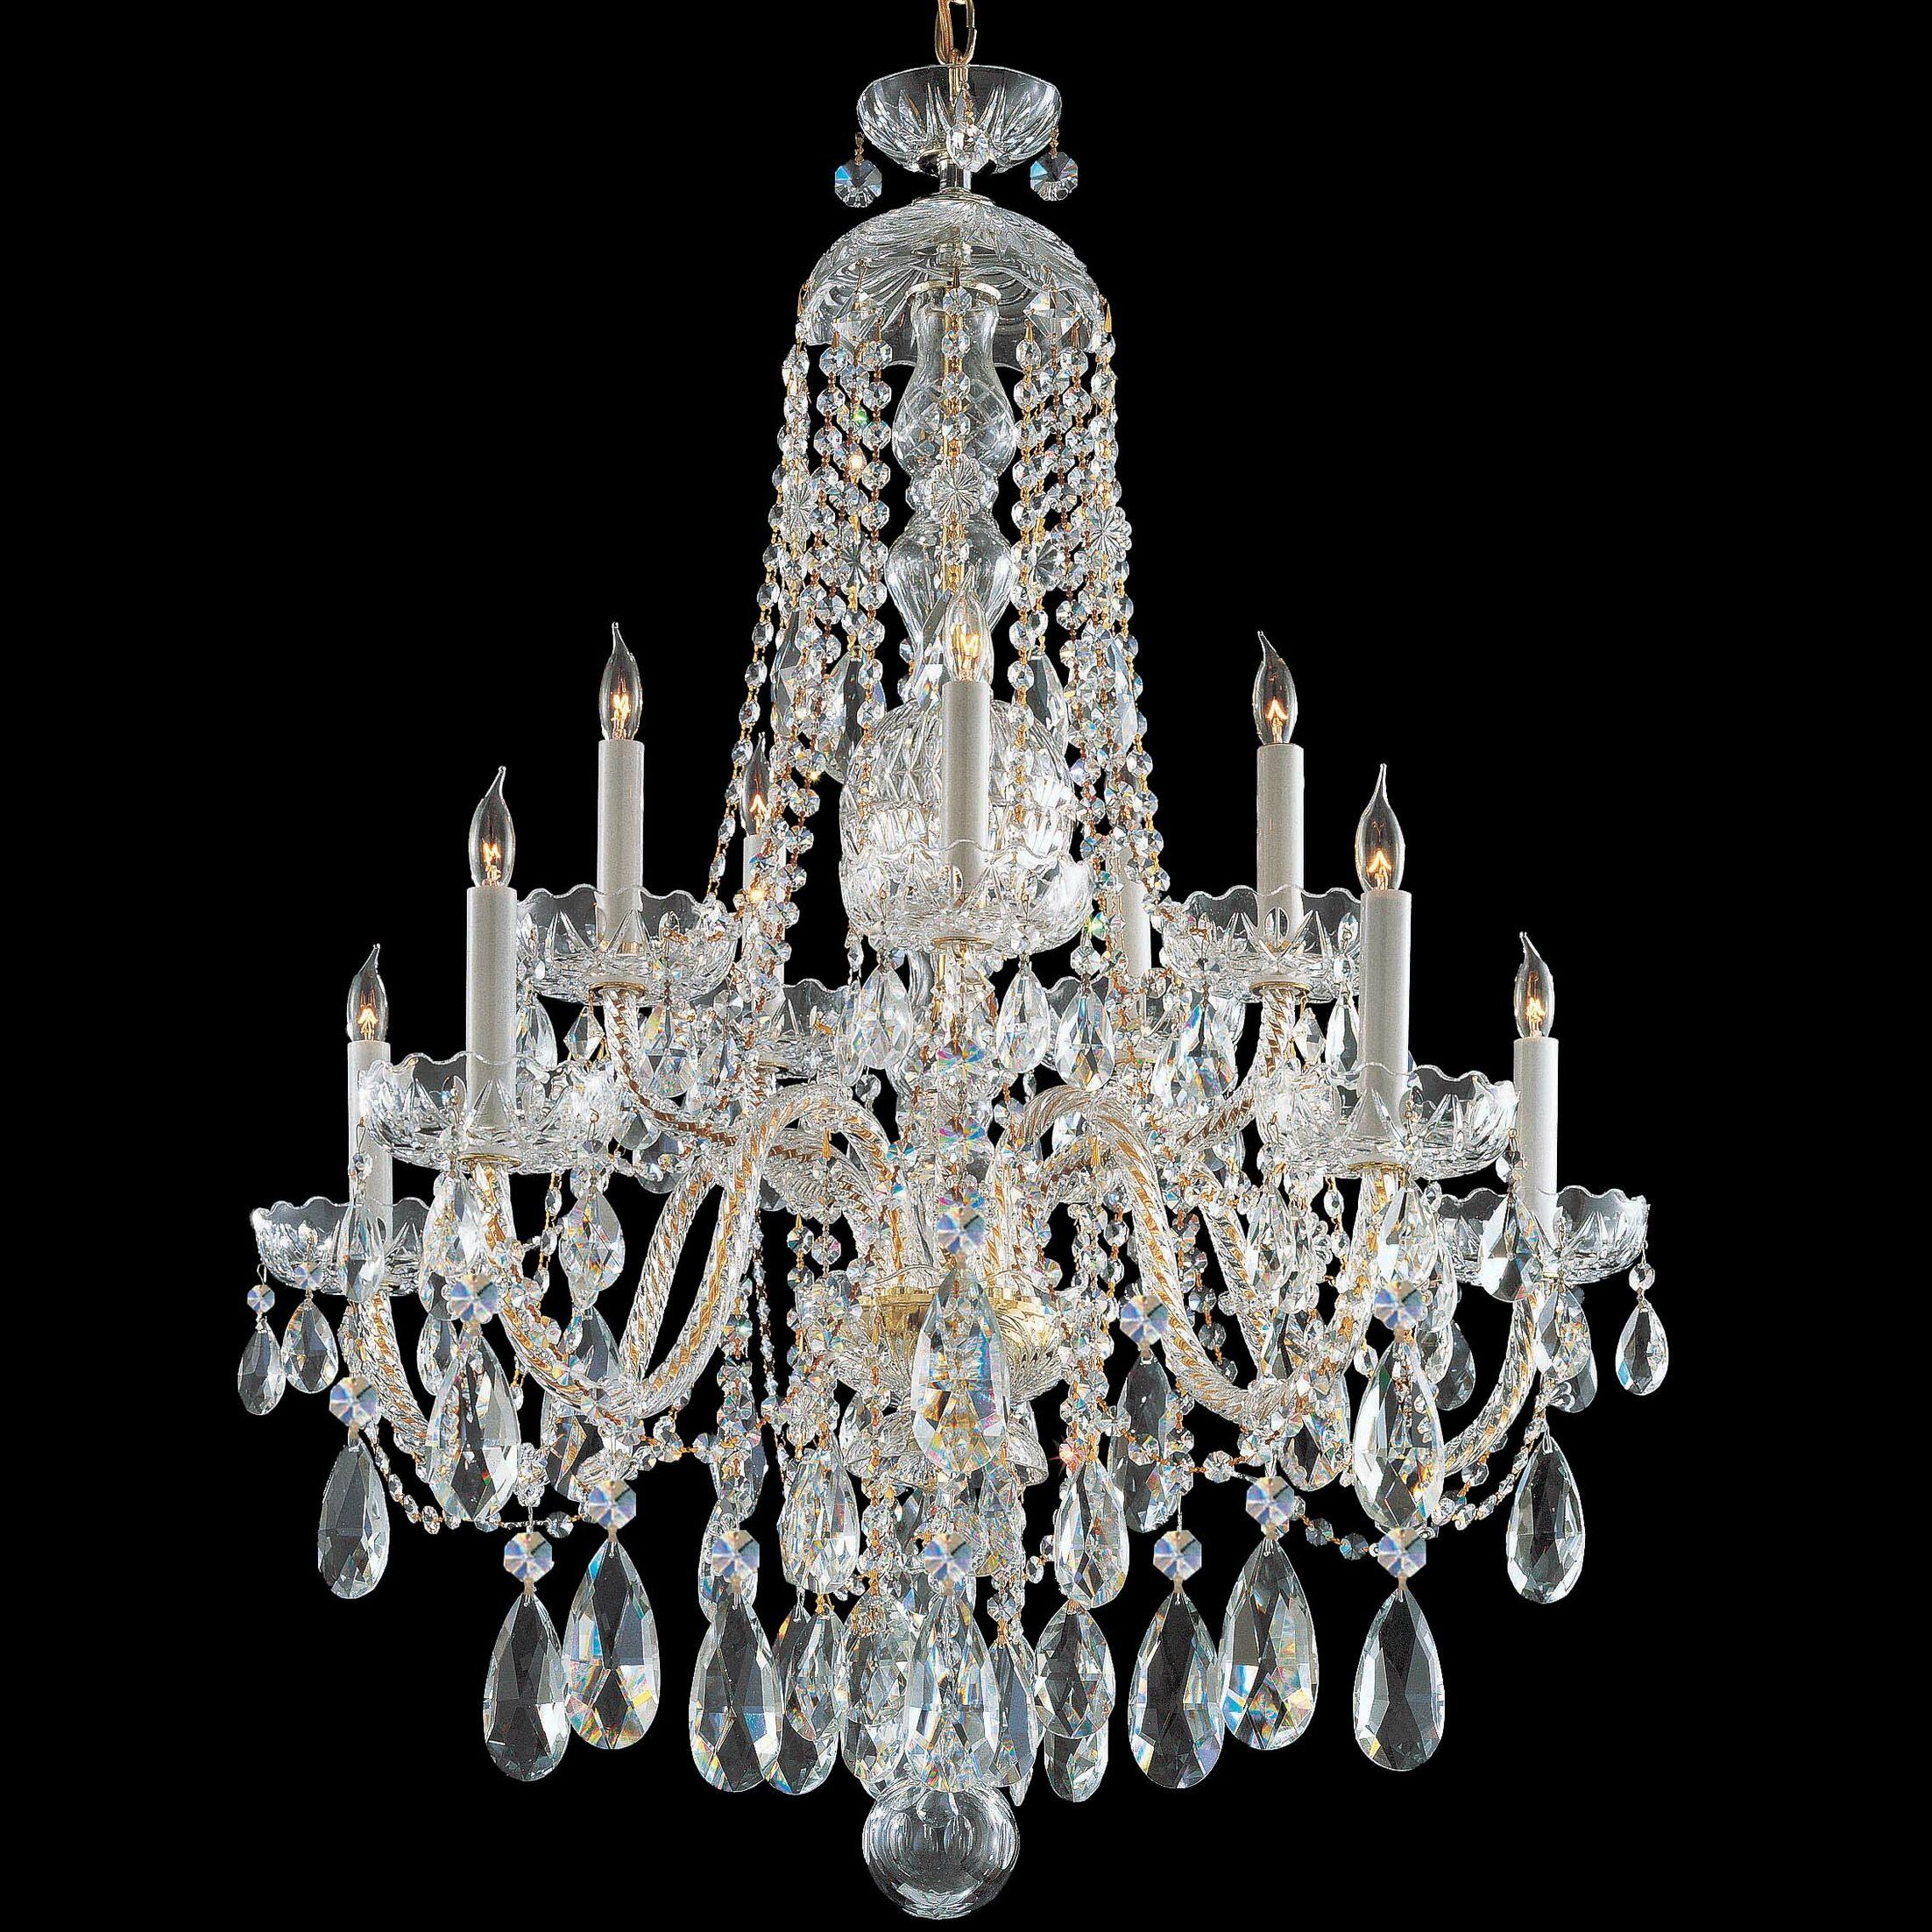 Careen 10-Light Candle Style Chandelier Crystal: Swarovski Spectra, Finish: Polished Brass